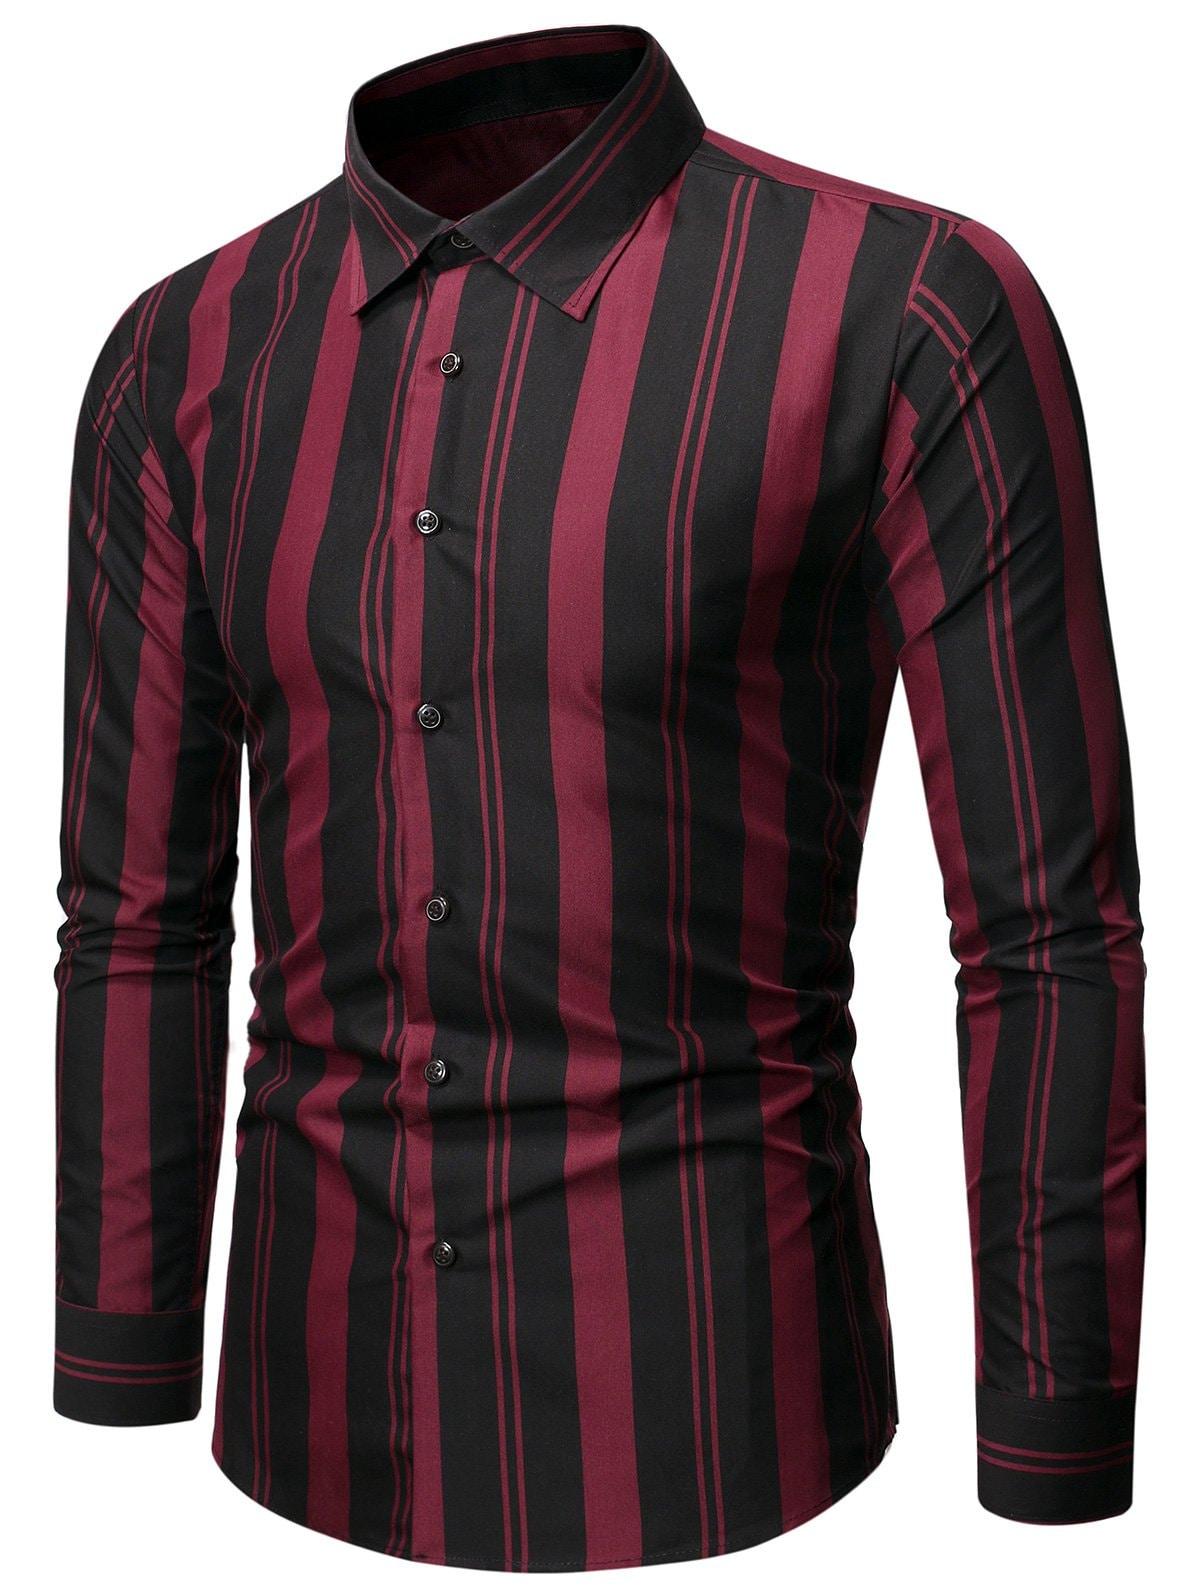 Balanced Striped Button Up Slim Shirt